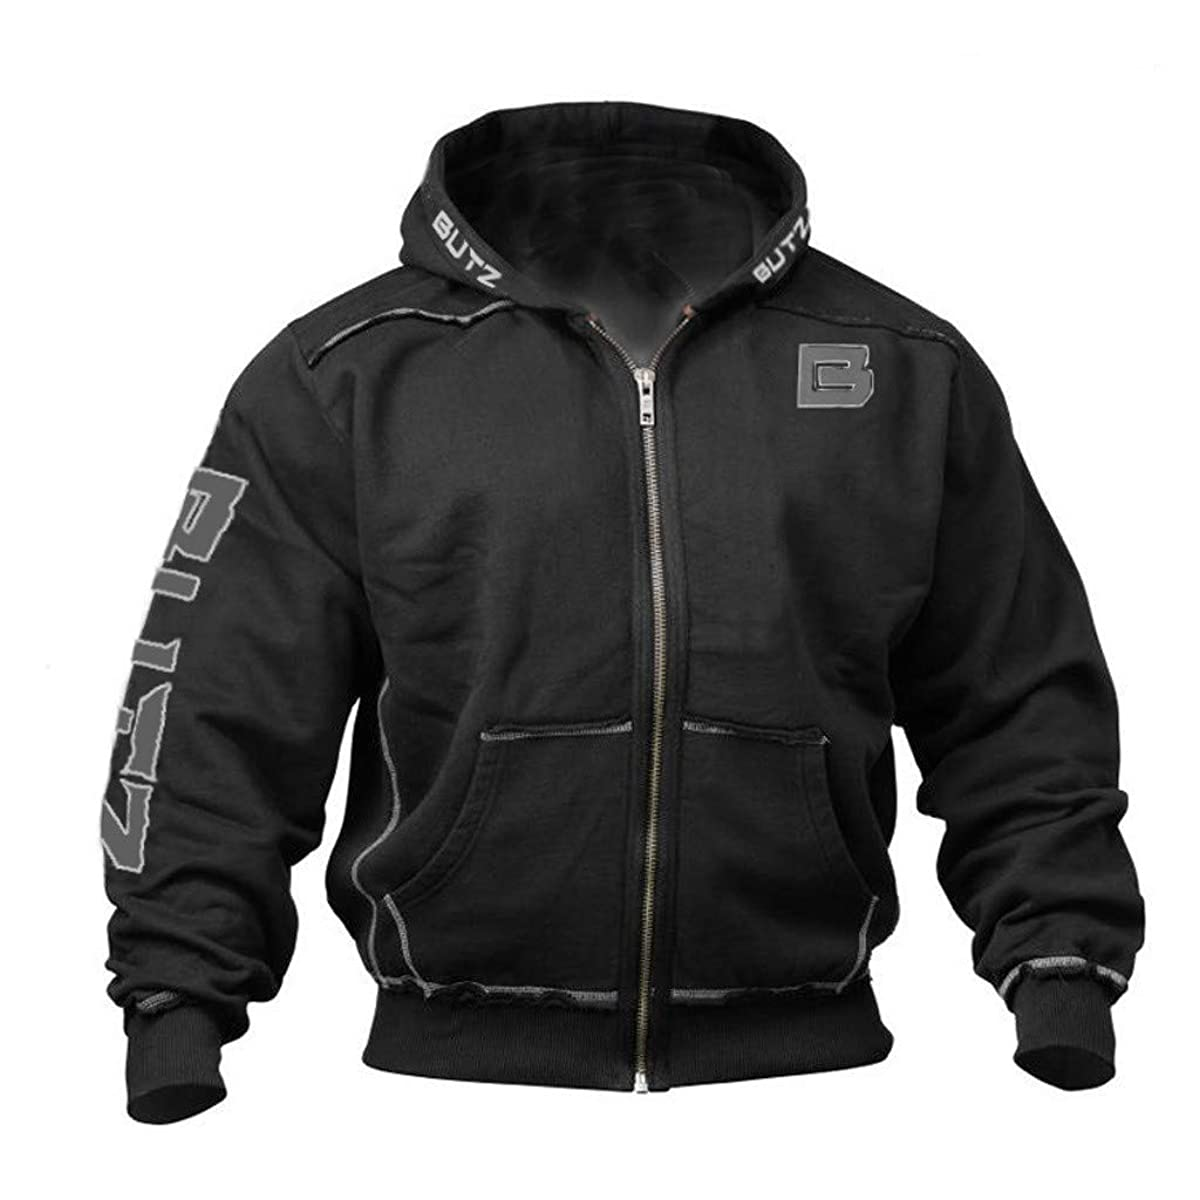 WUYIMC Men Jacket Coat, Winter Splicing Zipper Color Pullover Long Sleeve Hooded Sweatshirt Tops Blouse